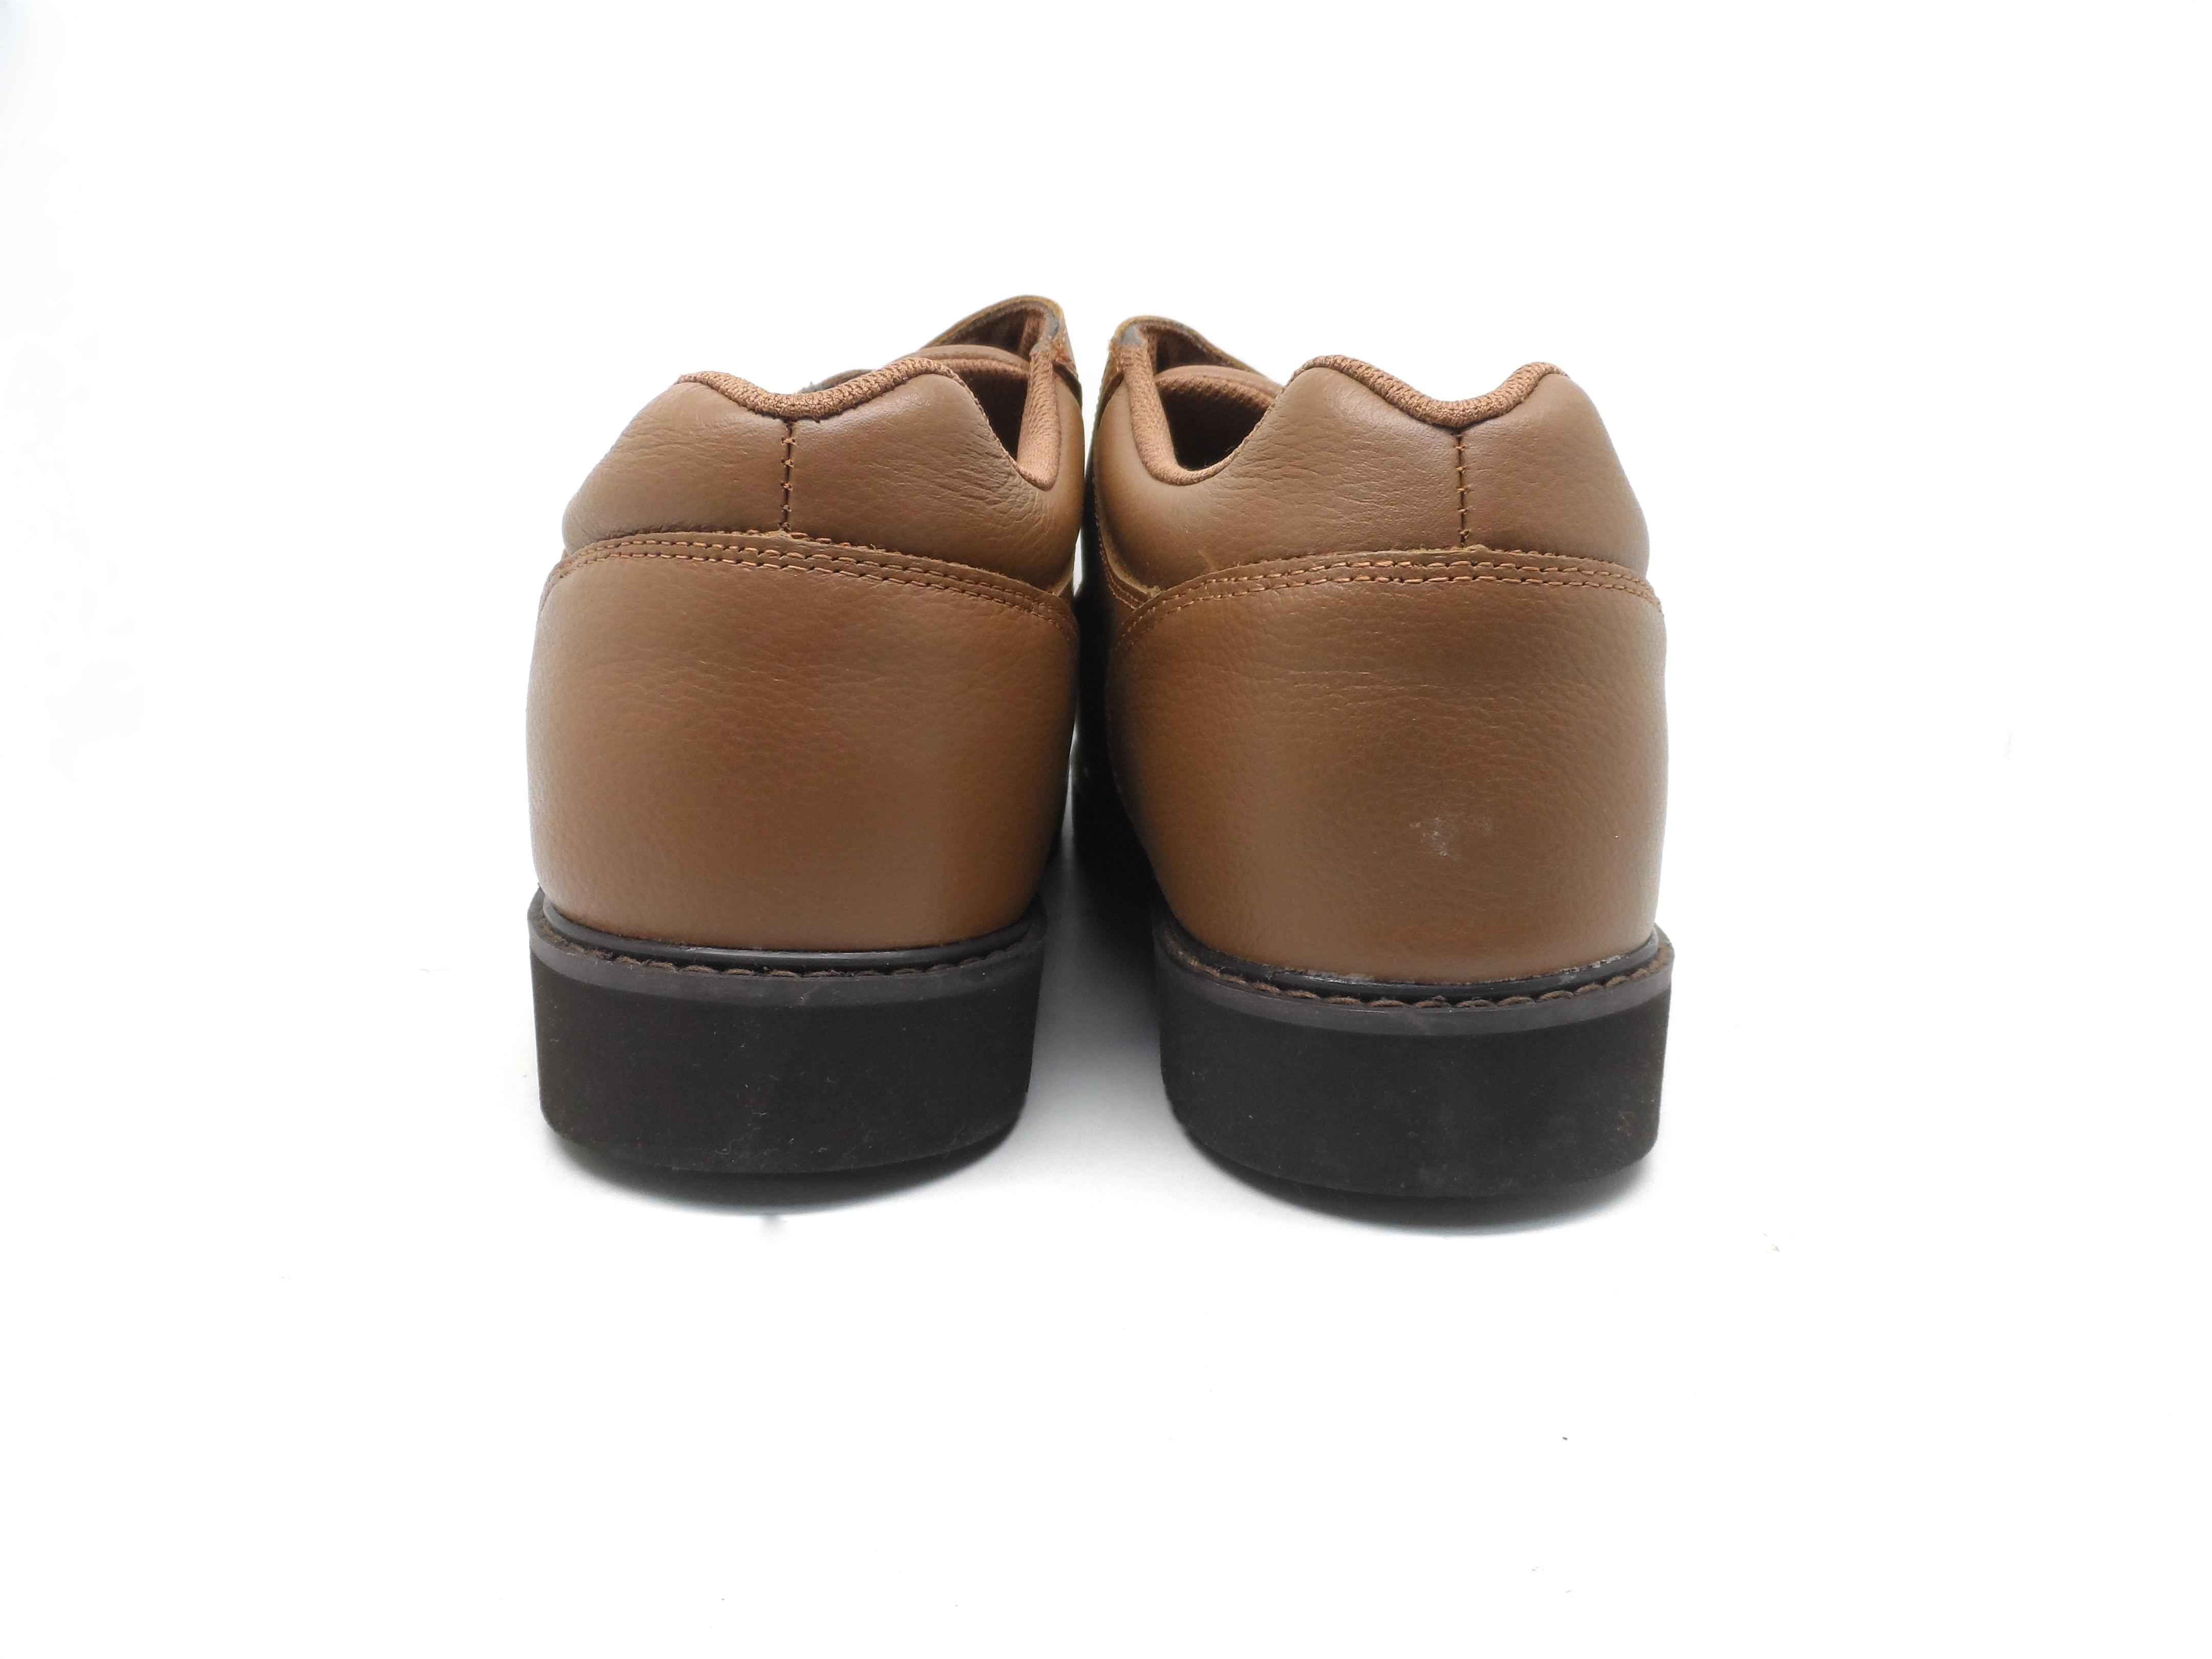 haband s adjust o pedic comfort shoe brown size 13 3e